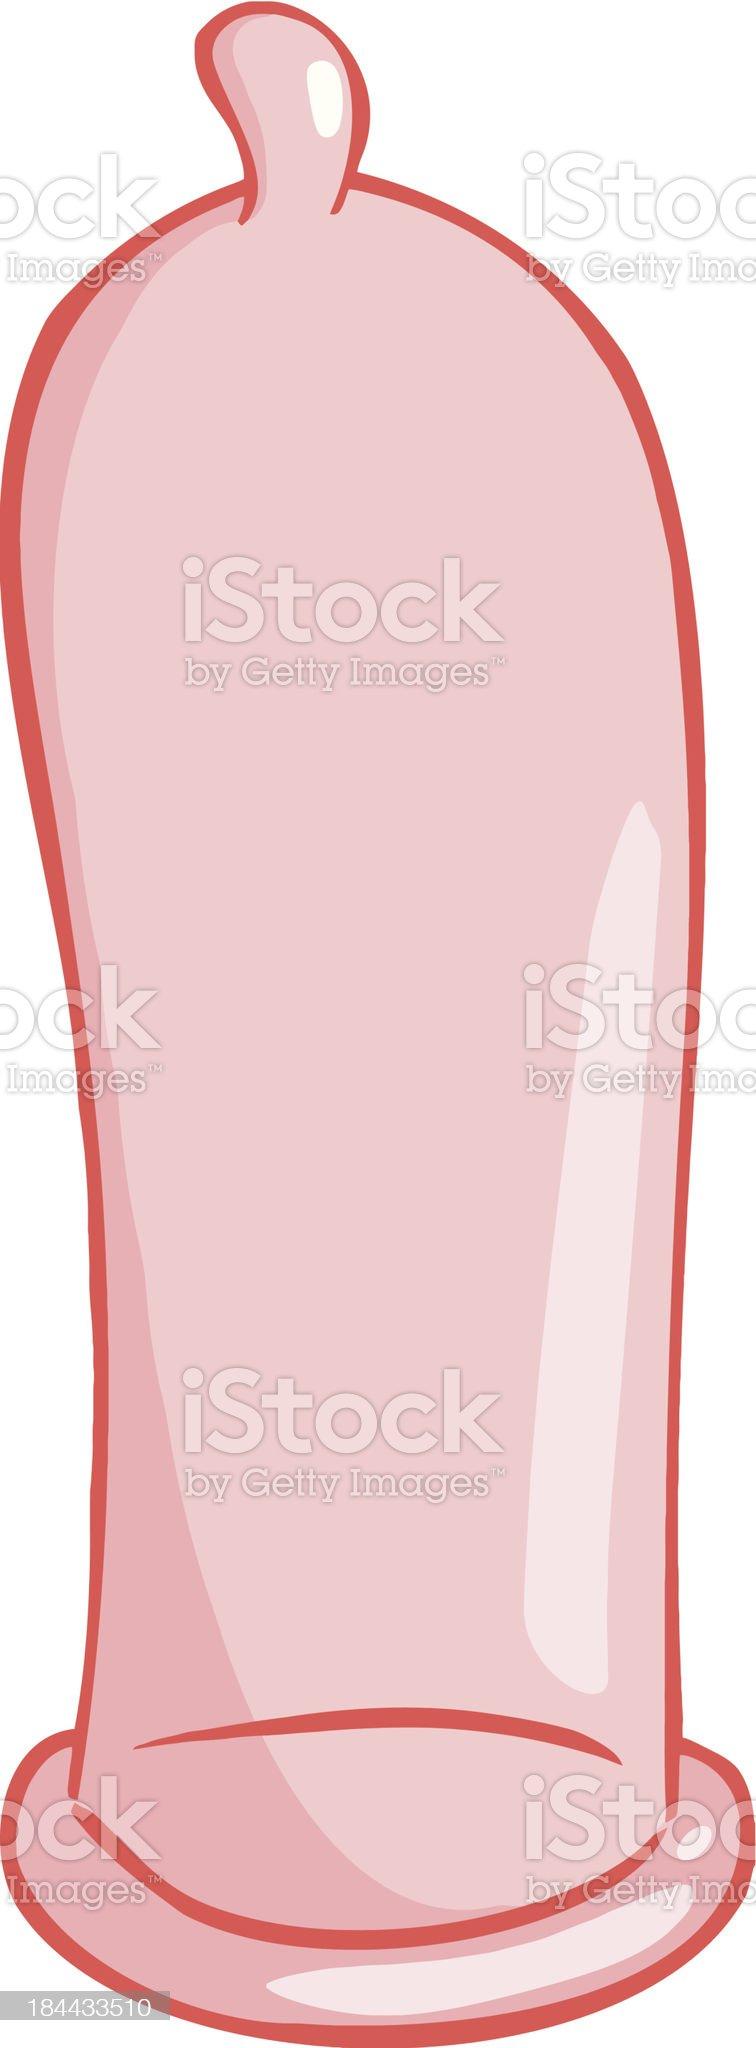 Pink Condom royalty-free stock vector art